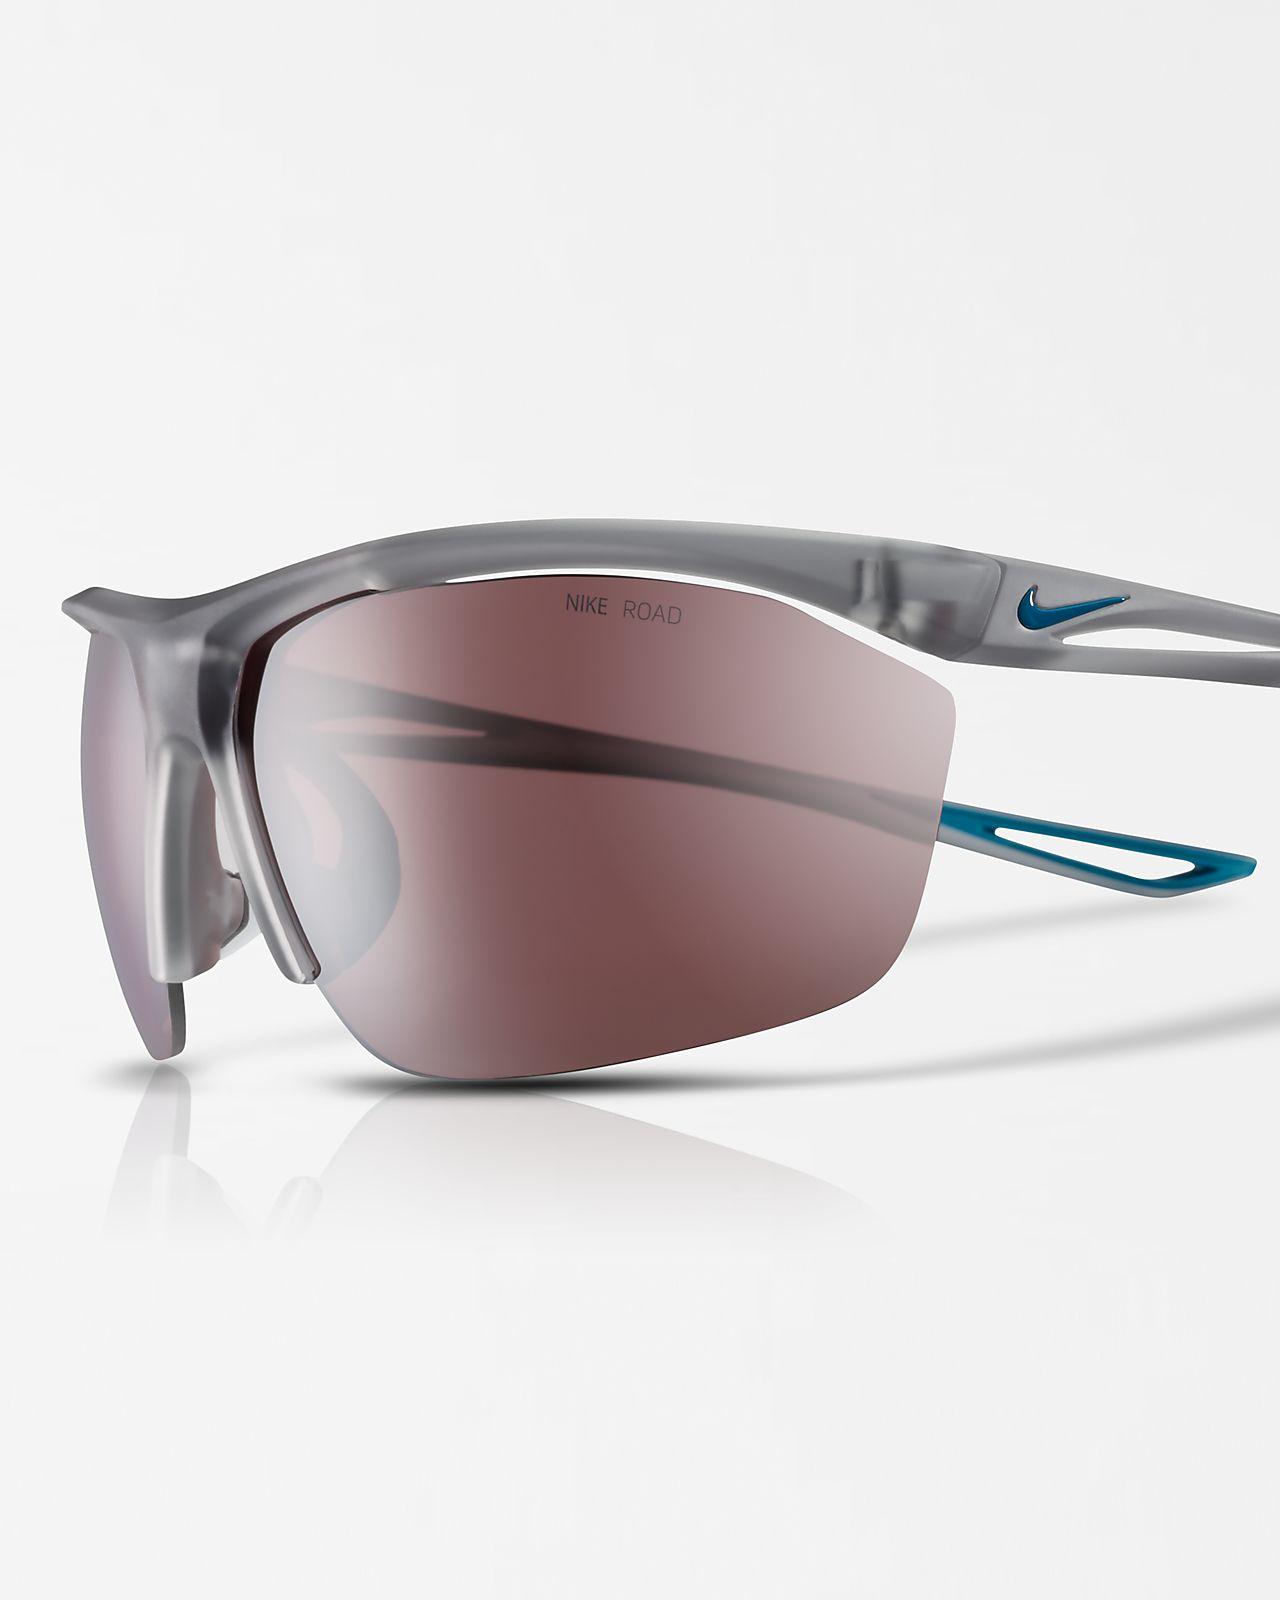 Nike Tailwind S Road Tint Running Sunglasses